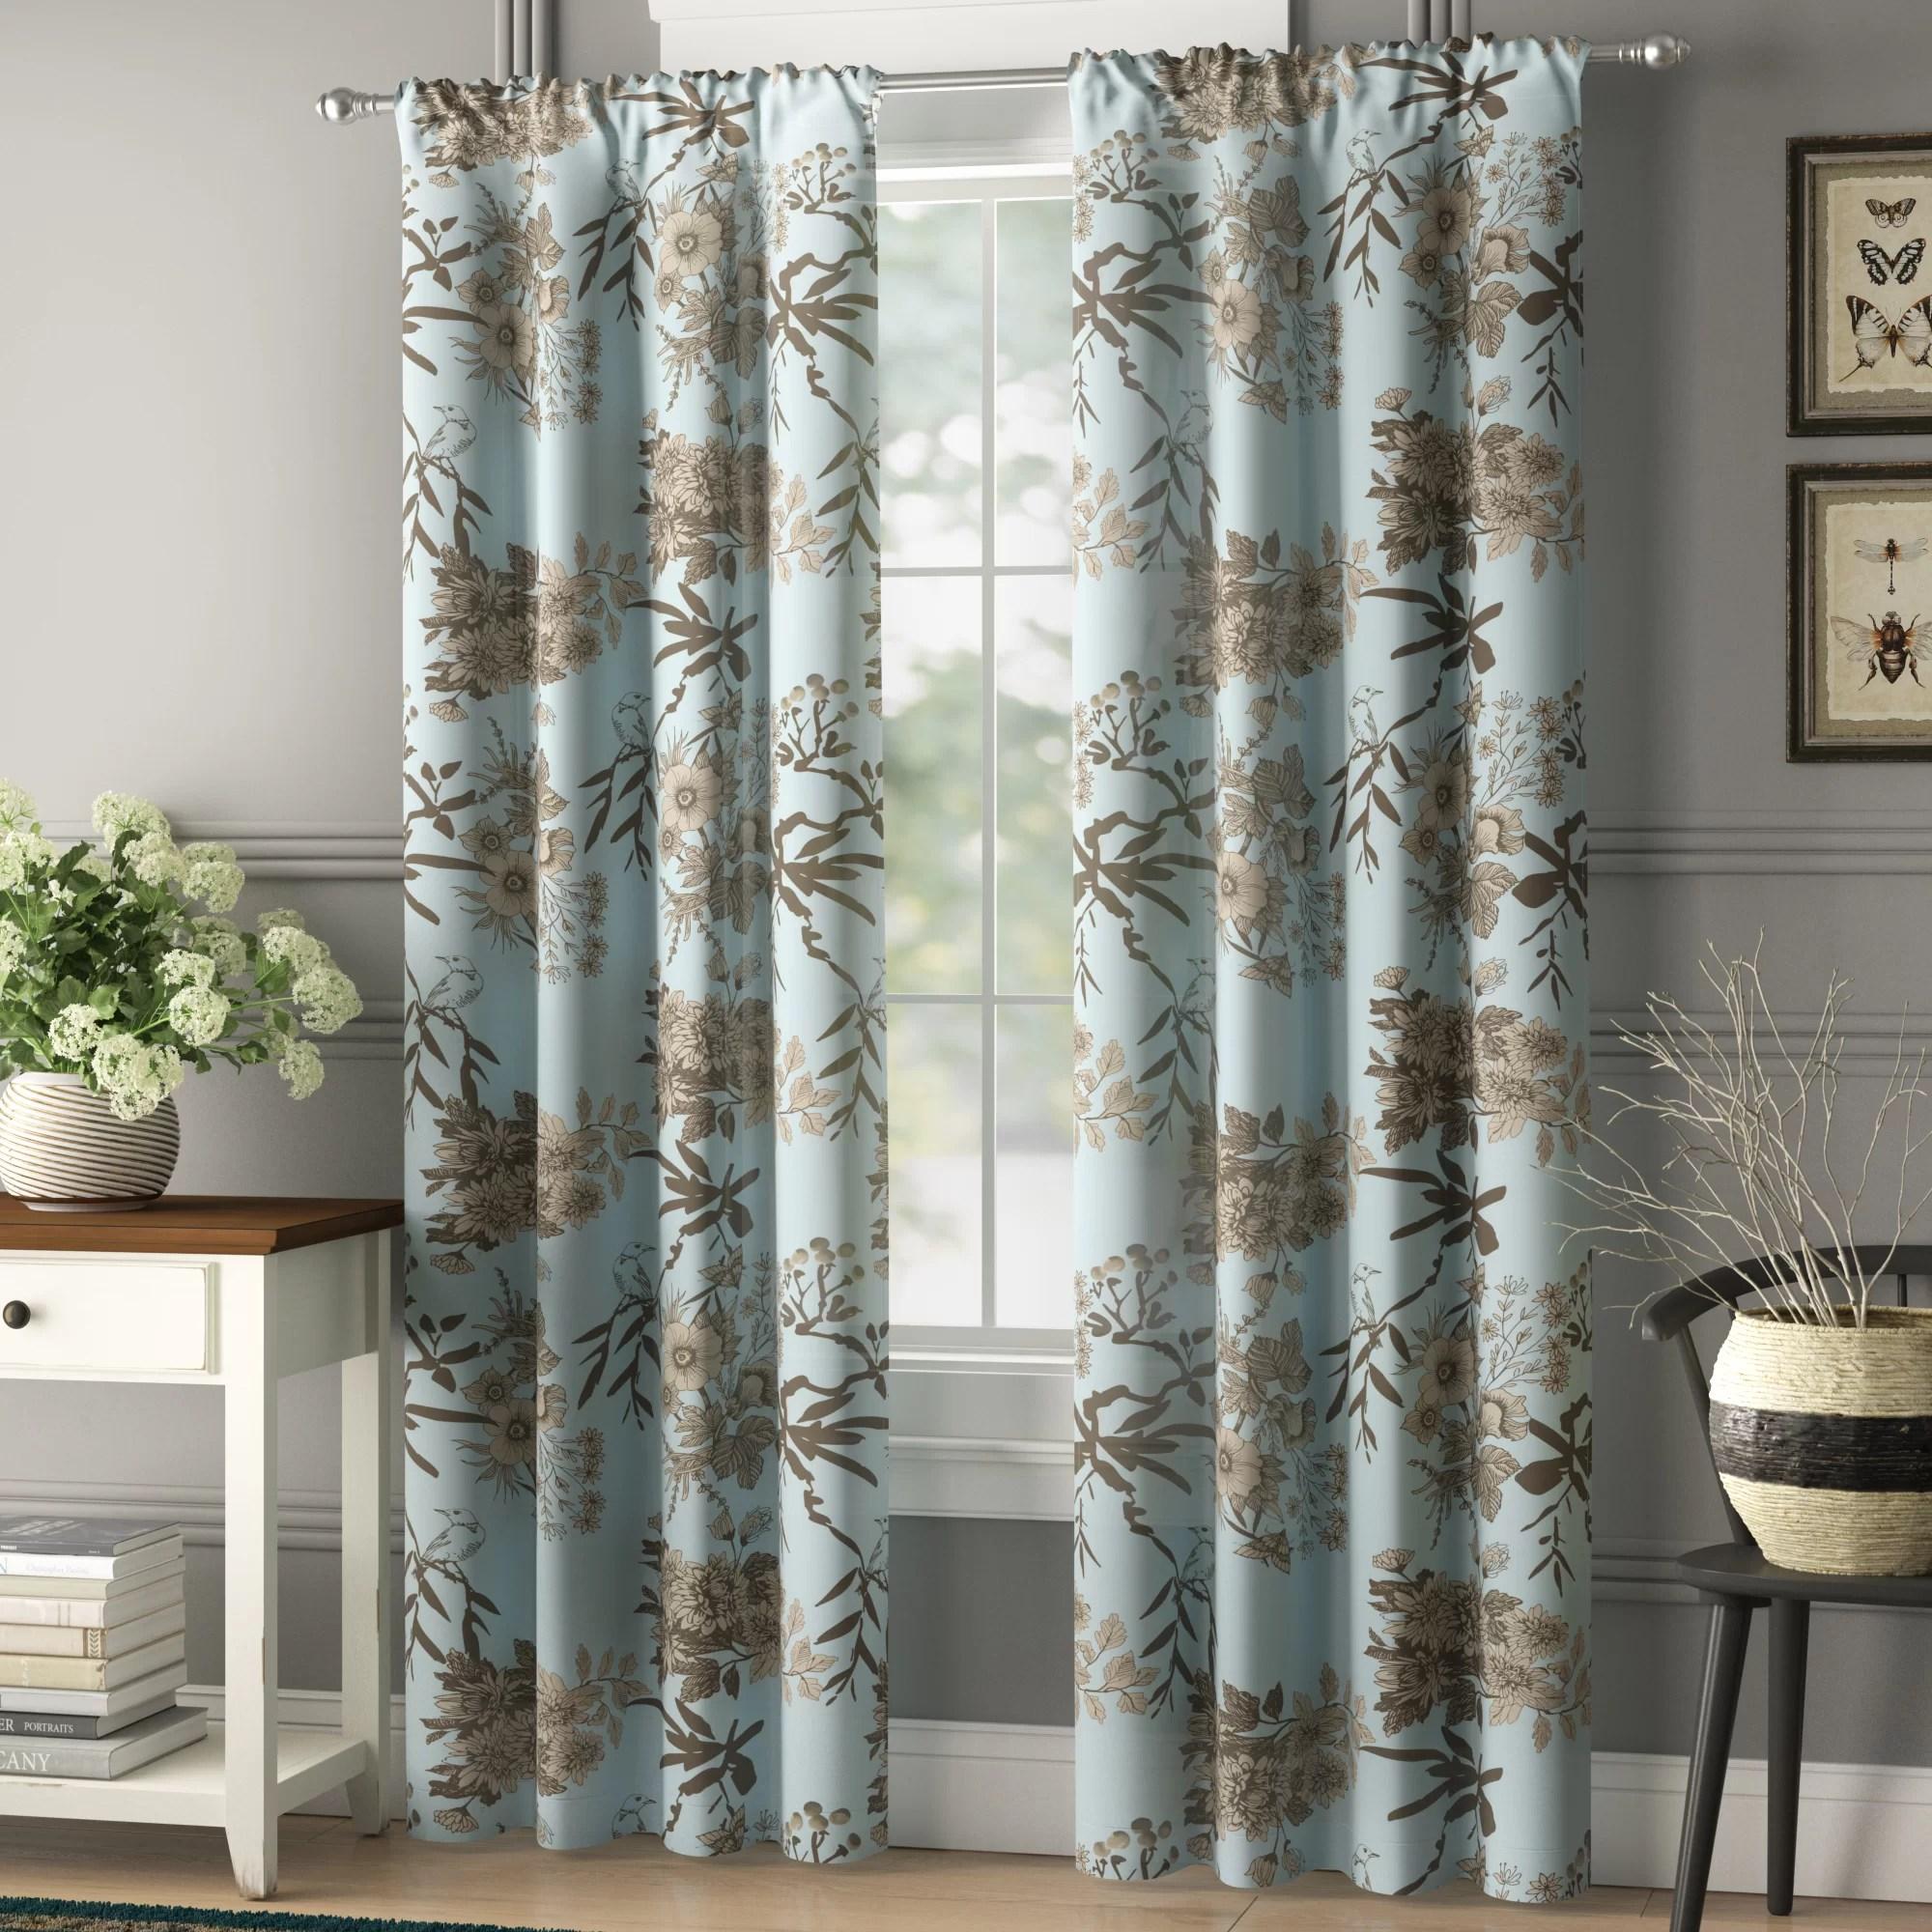 baldvina floral room darkening thermal curtain panels